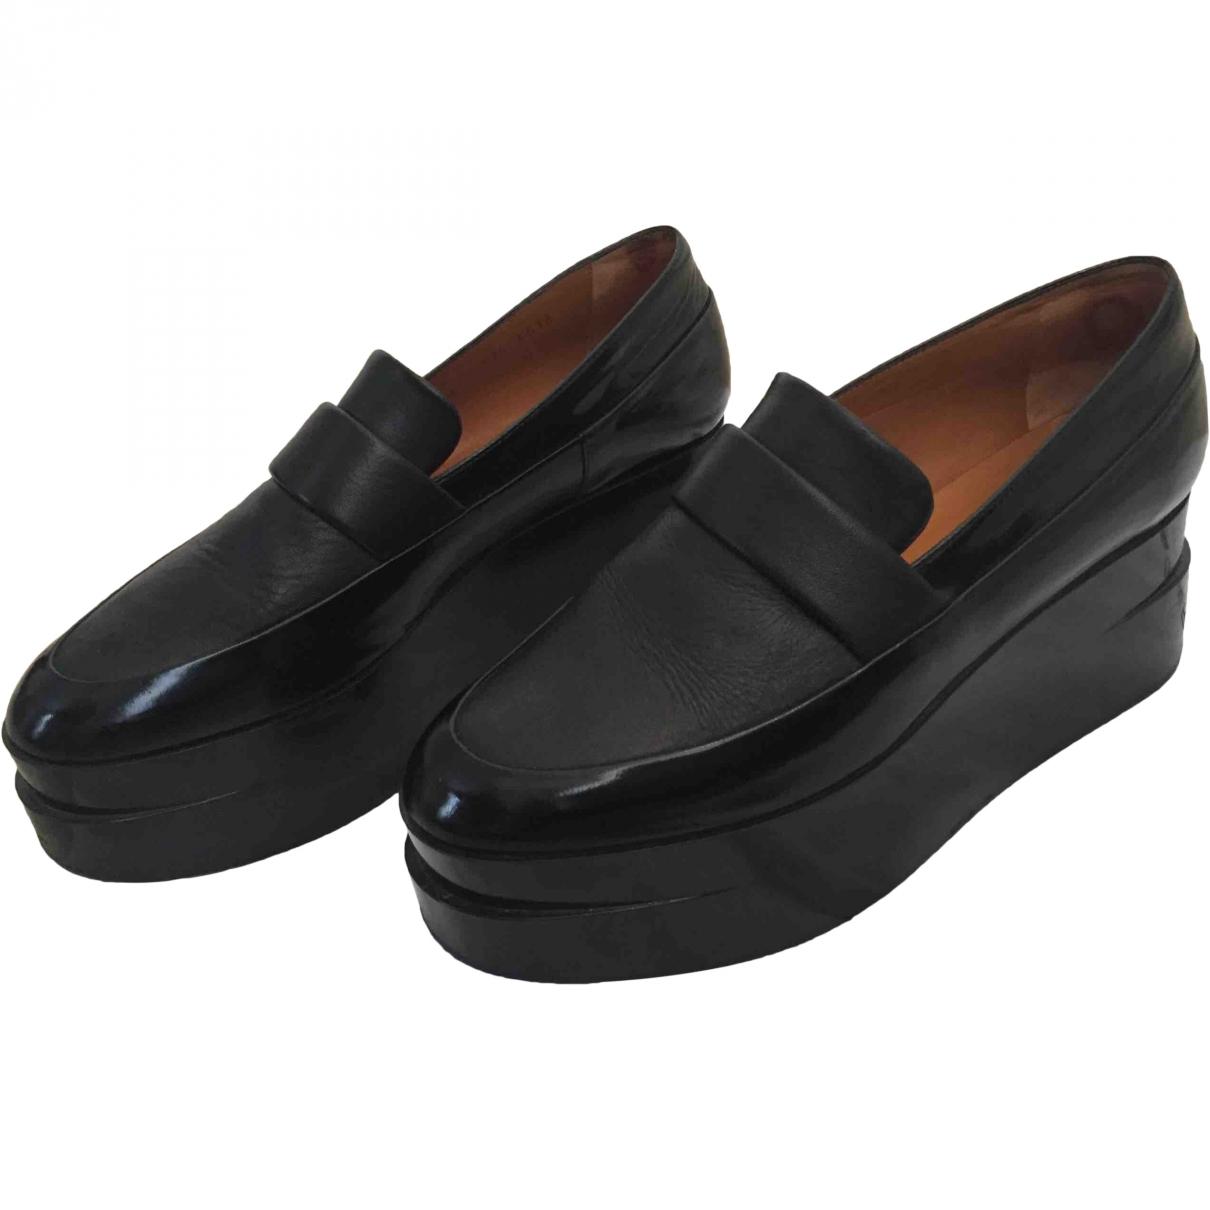 Robert Clergerie \N Black Leather Flats for Women 36.5 EU